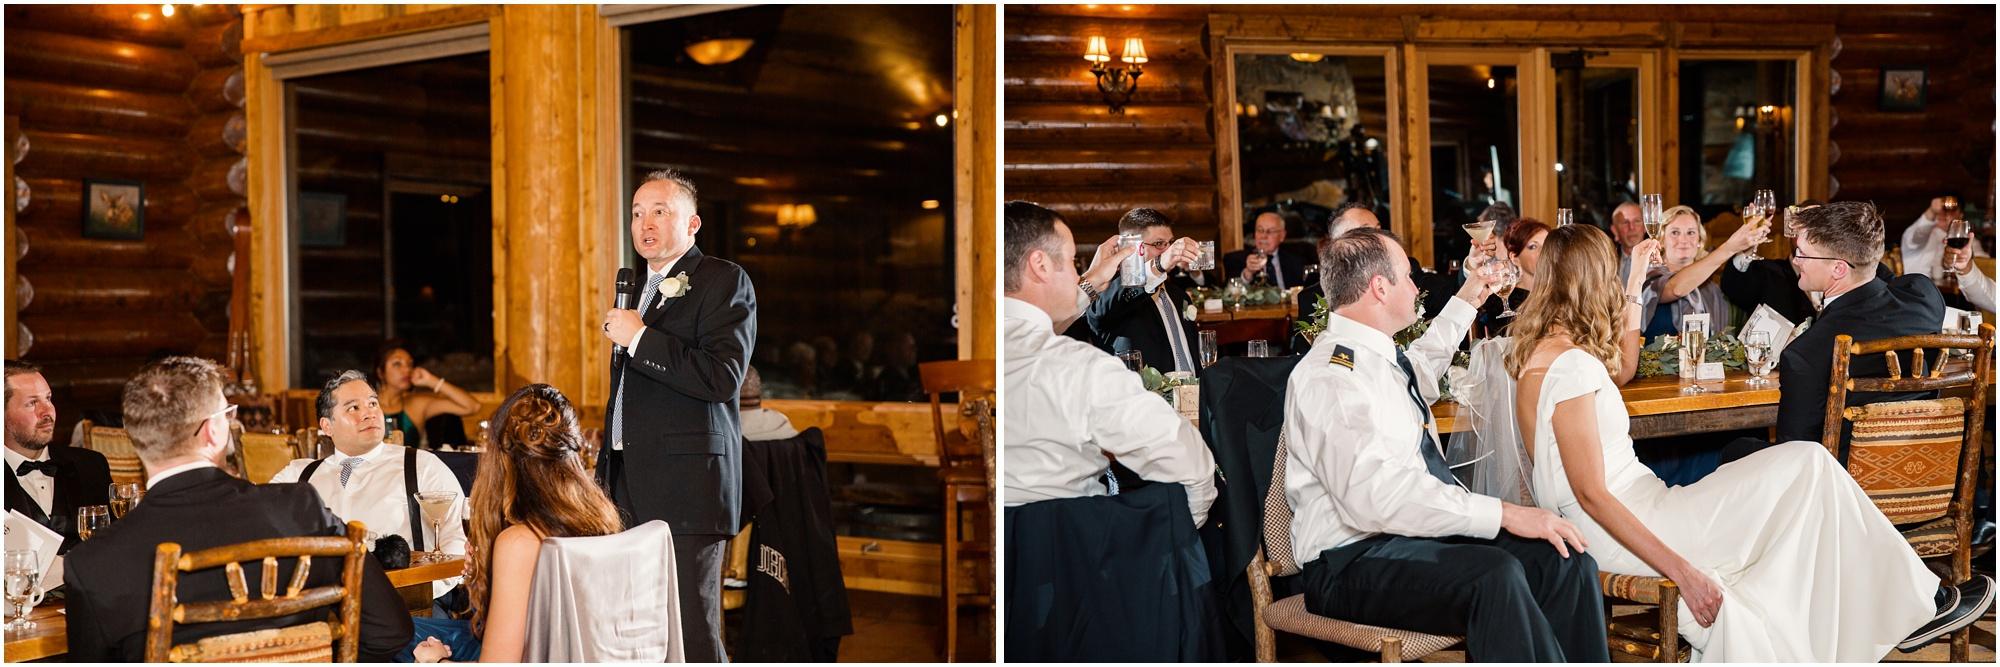 Breckenridge-Wedding-Photographer_0052.jpg